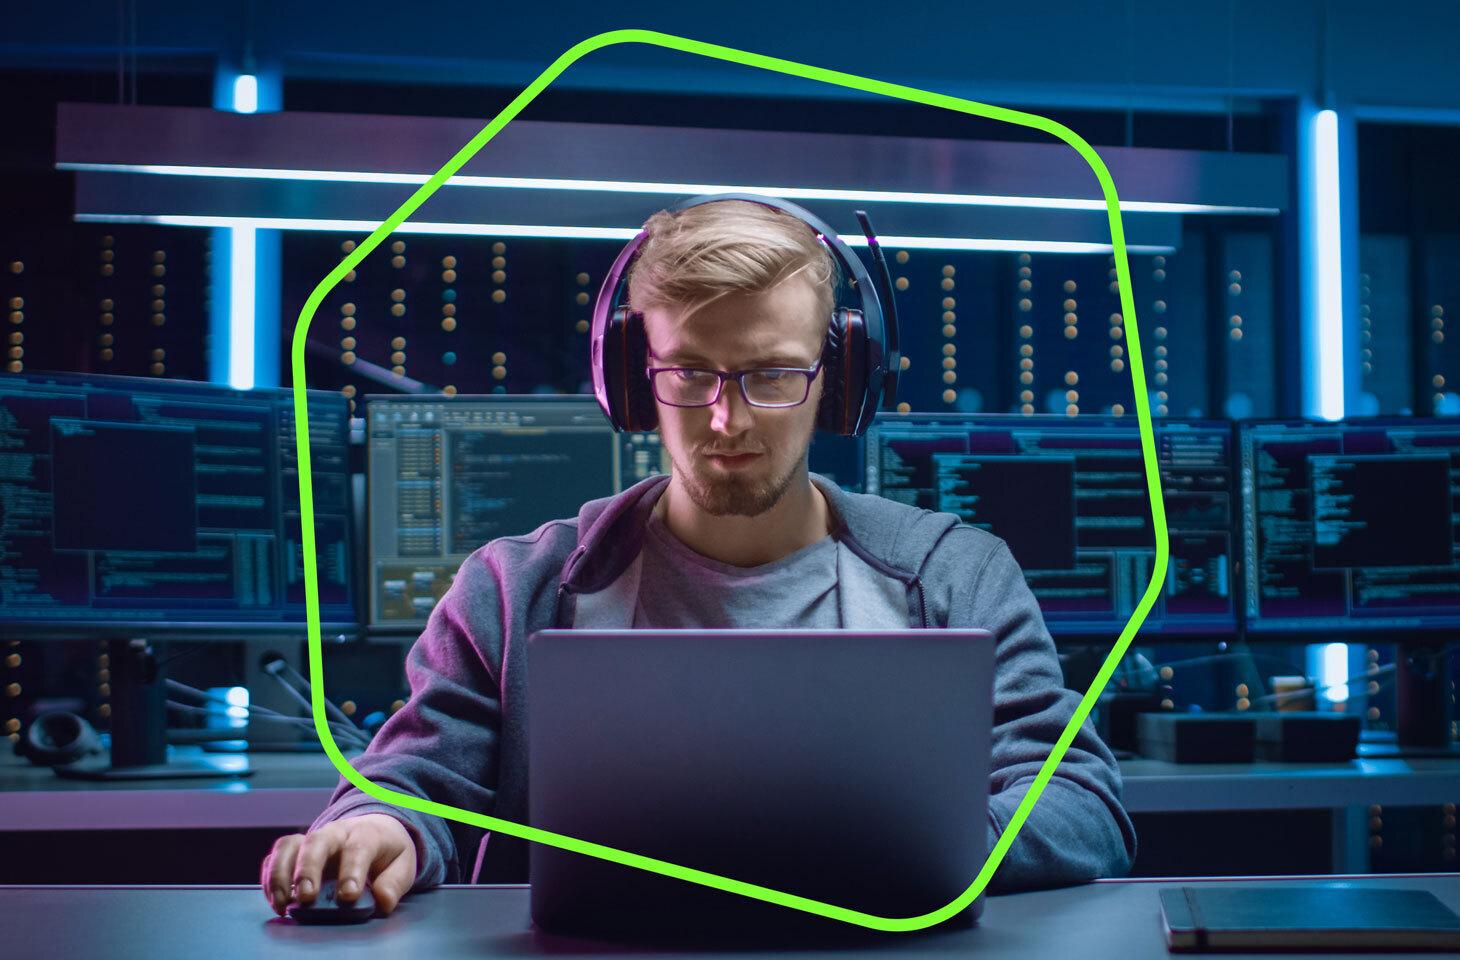 Kaspersky Ask the Analyst:セキュリティアナリストにアドバイスをもらう方法 | カスペルスキー公式ブログ